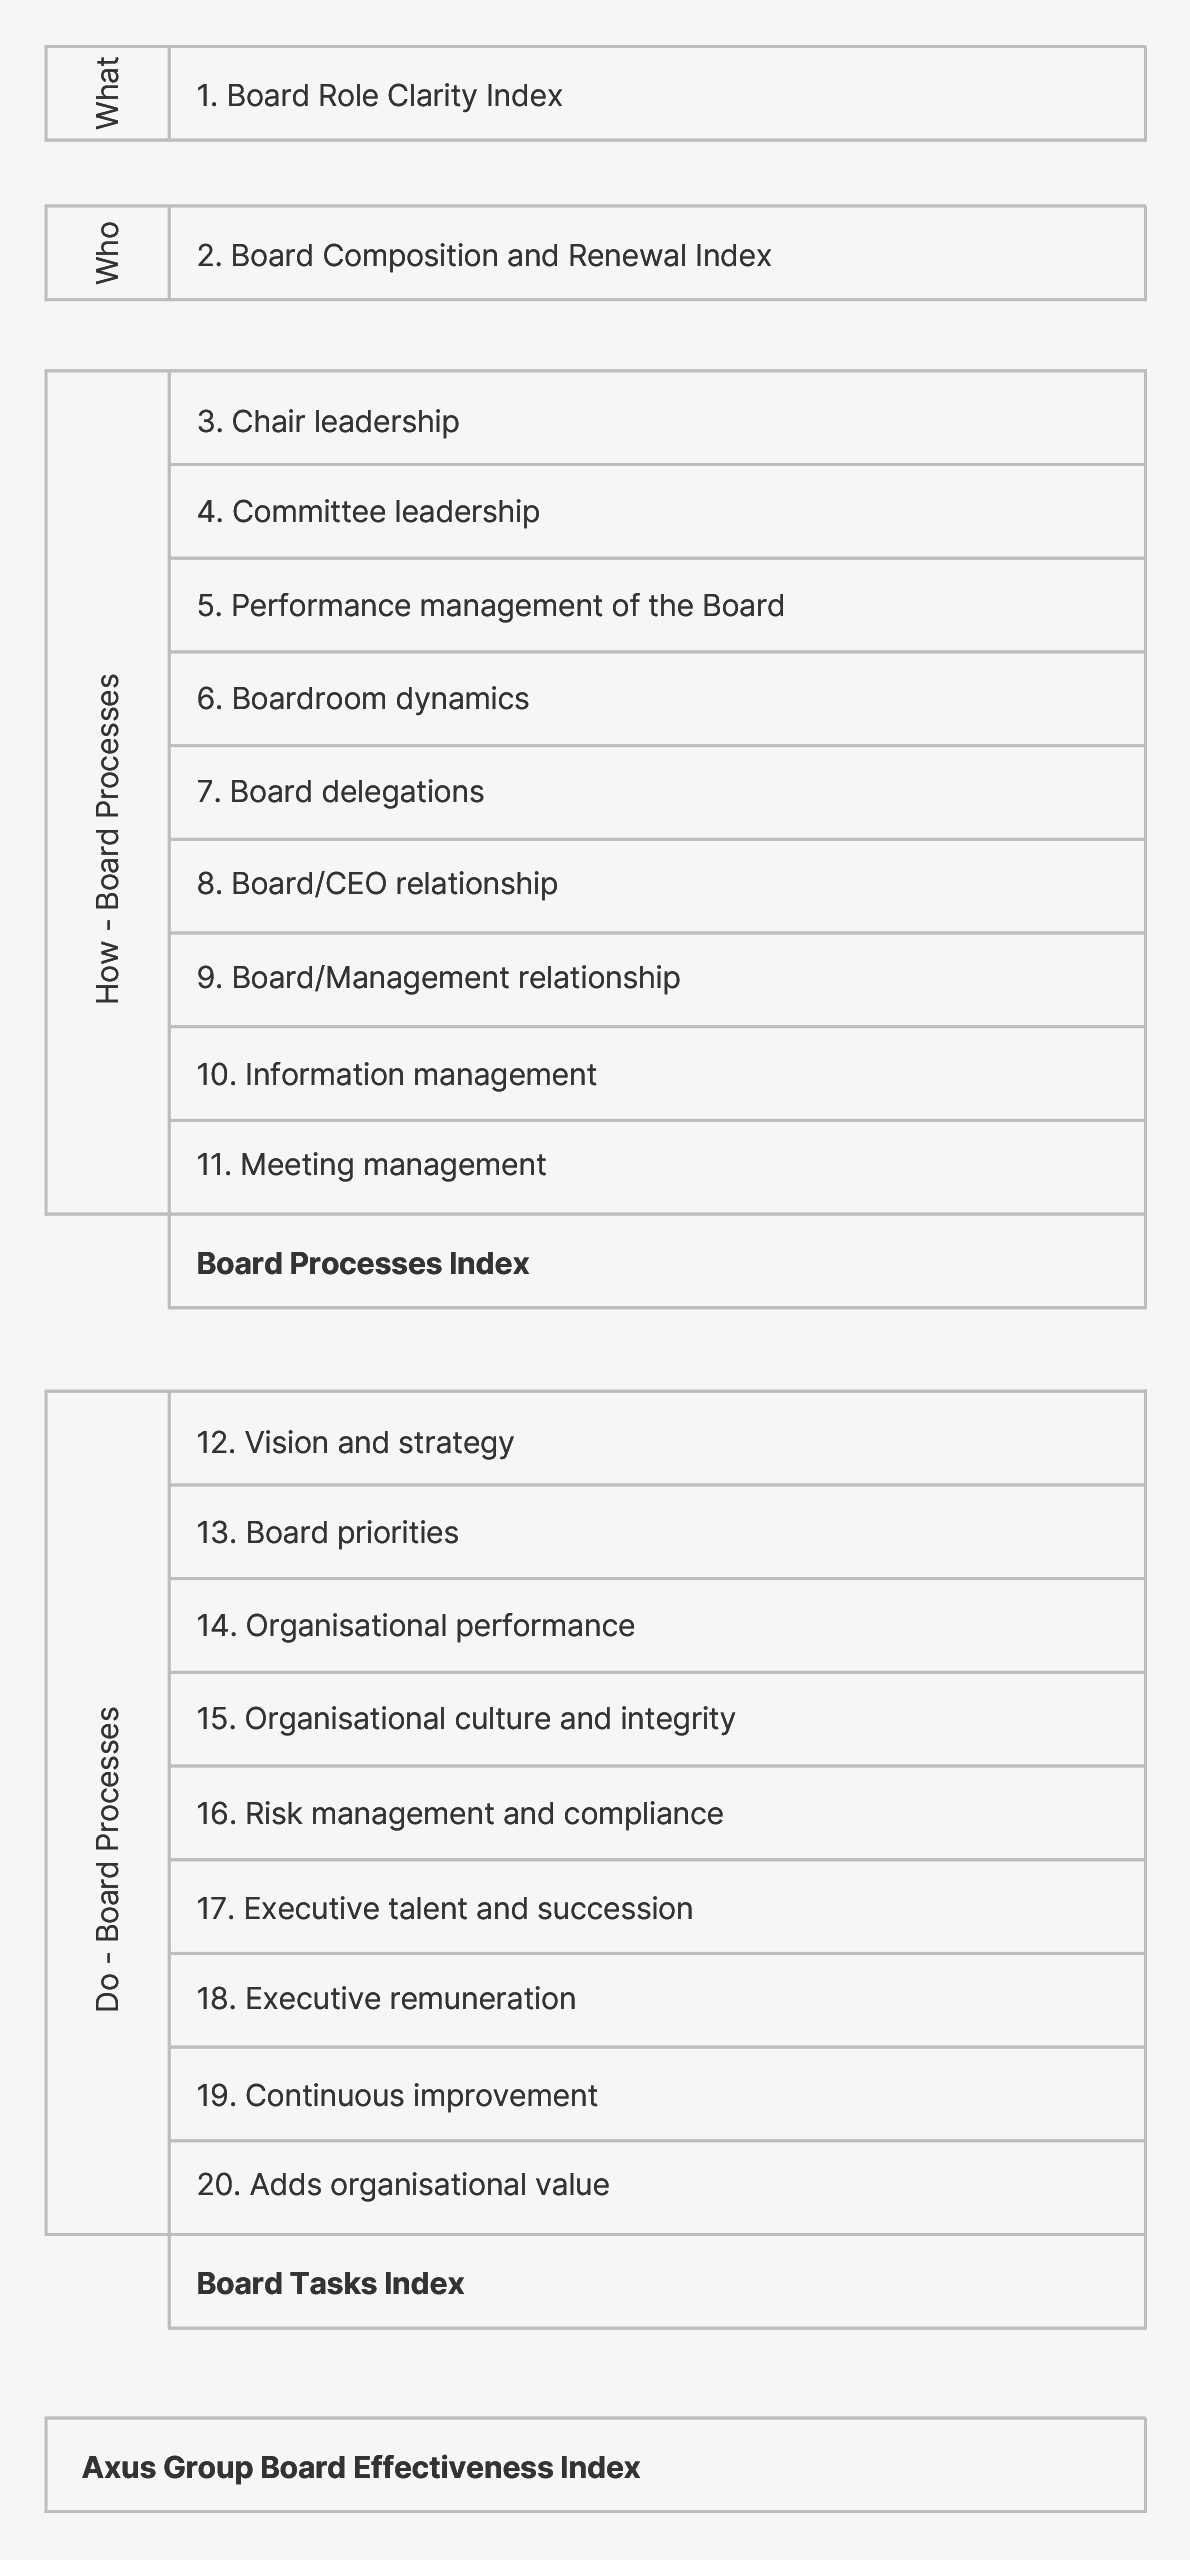 Digital service board effectiveness